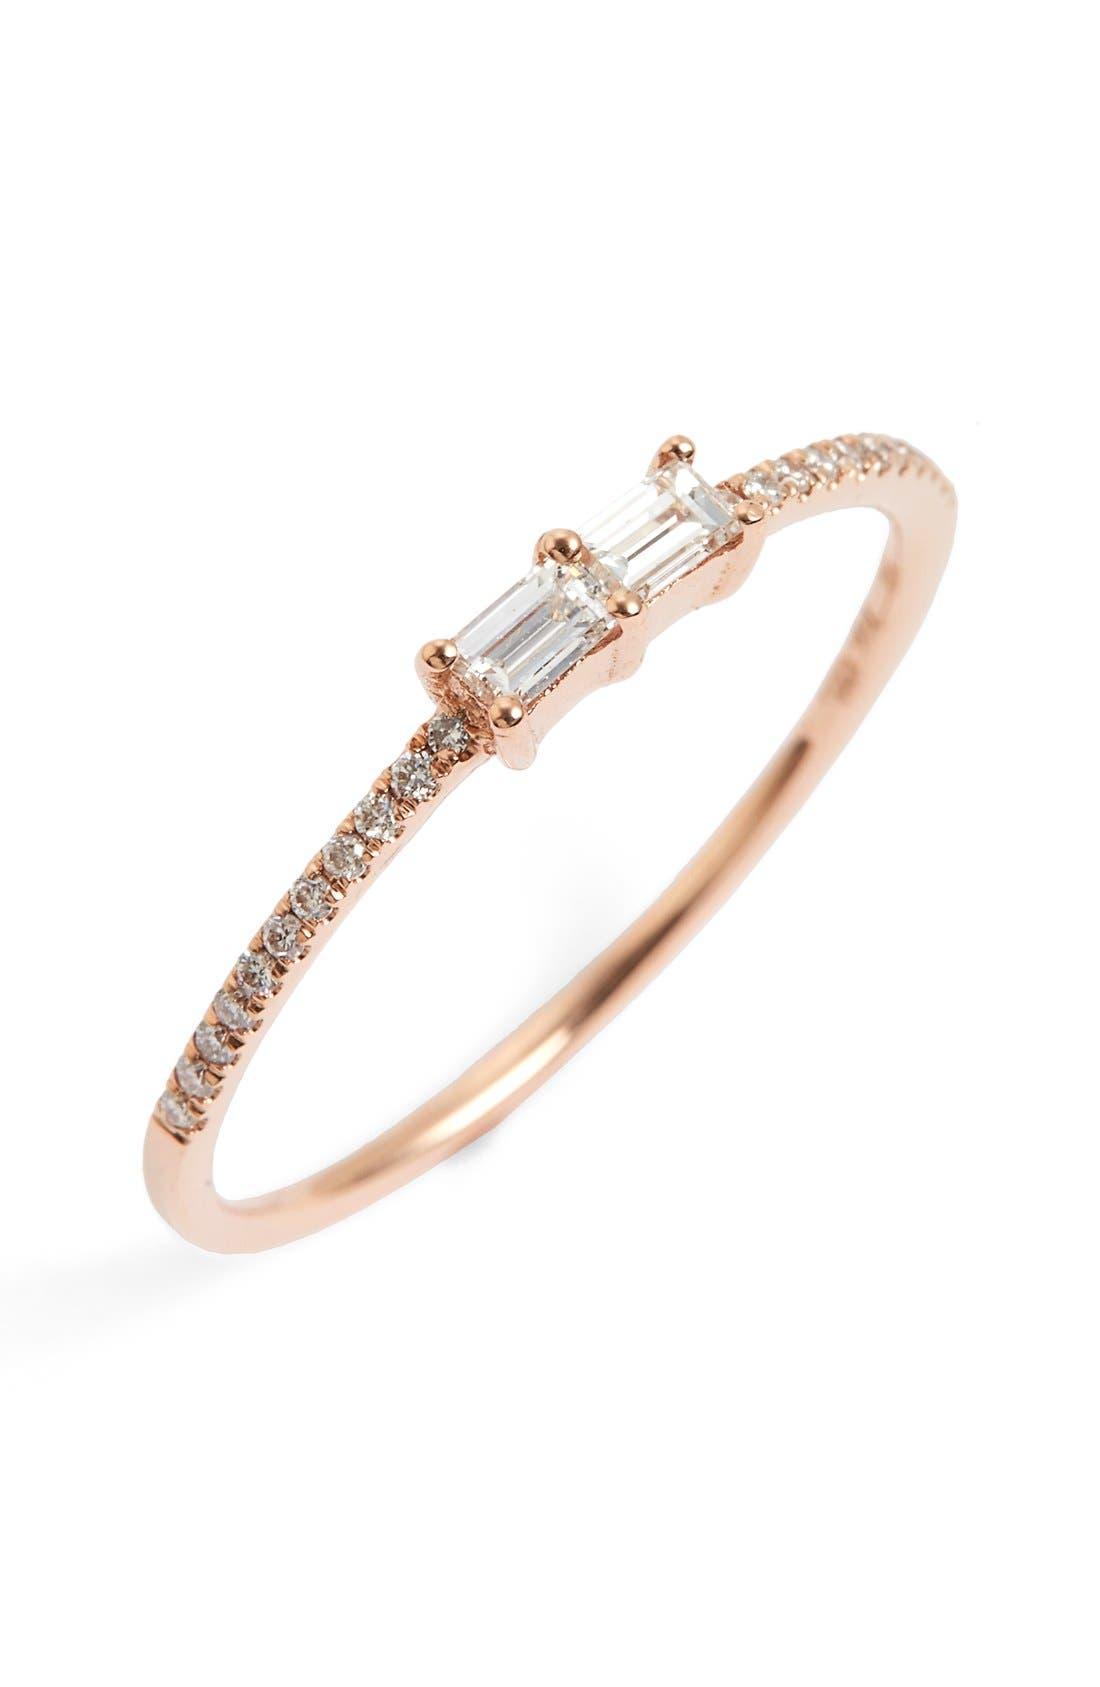 BONY LEVY Double Baguette Diamond Ring